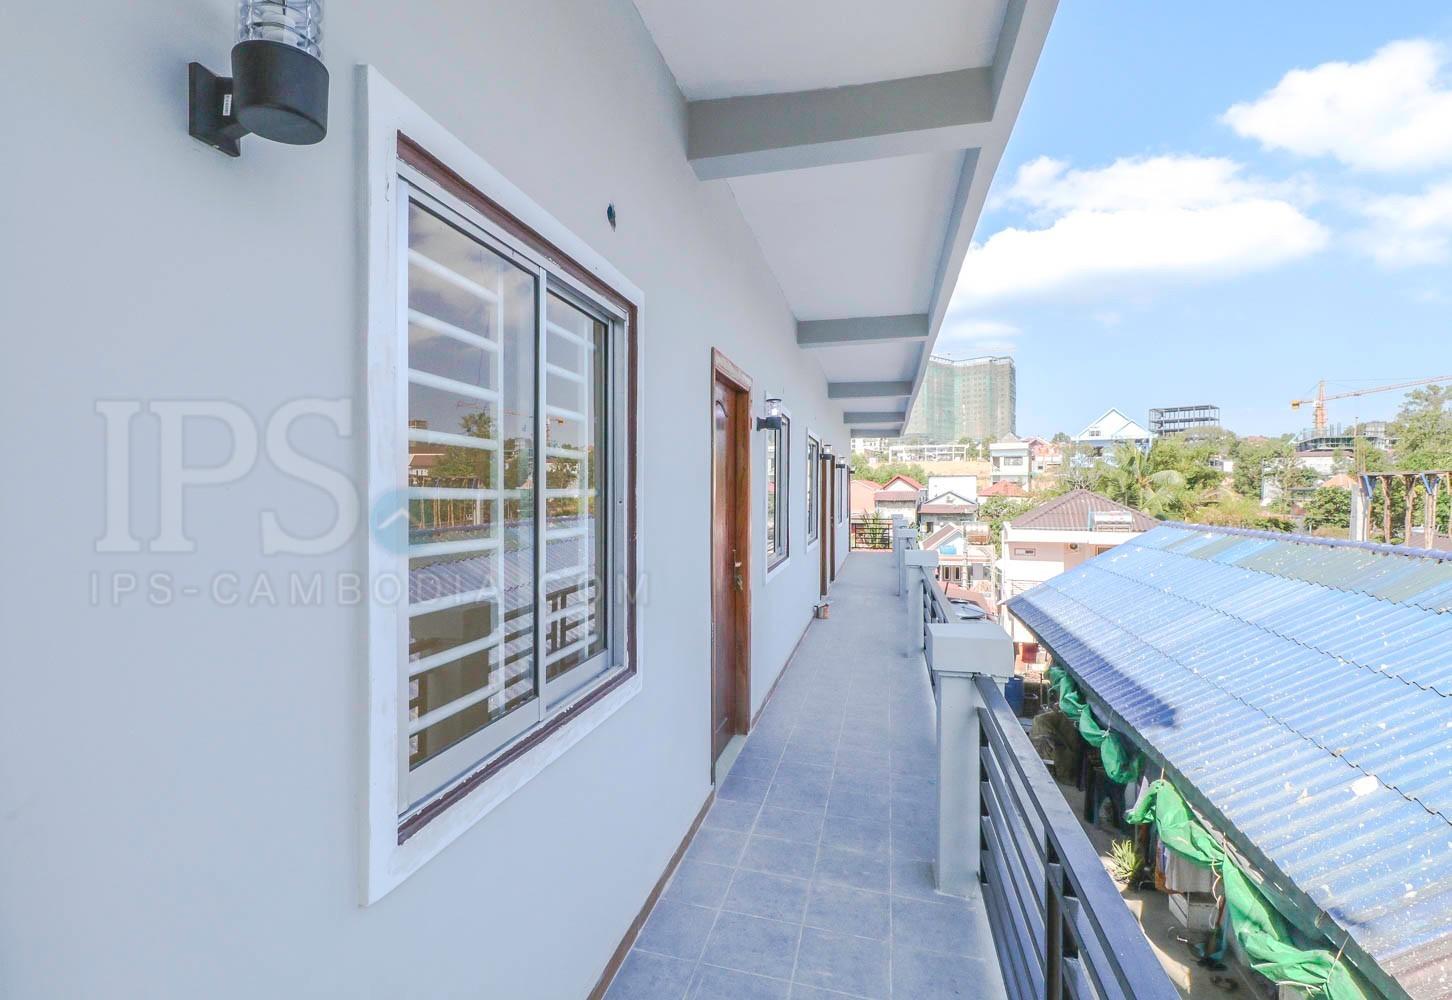 15 Rooms Apartment For Rent - Mittapheap, Sihanoukville